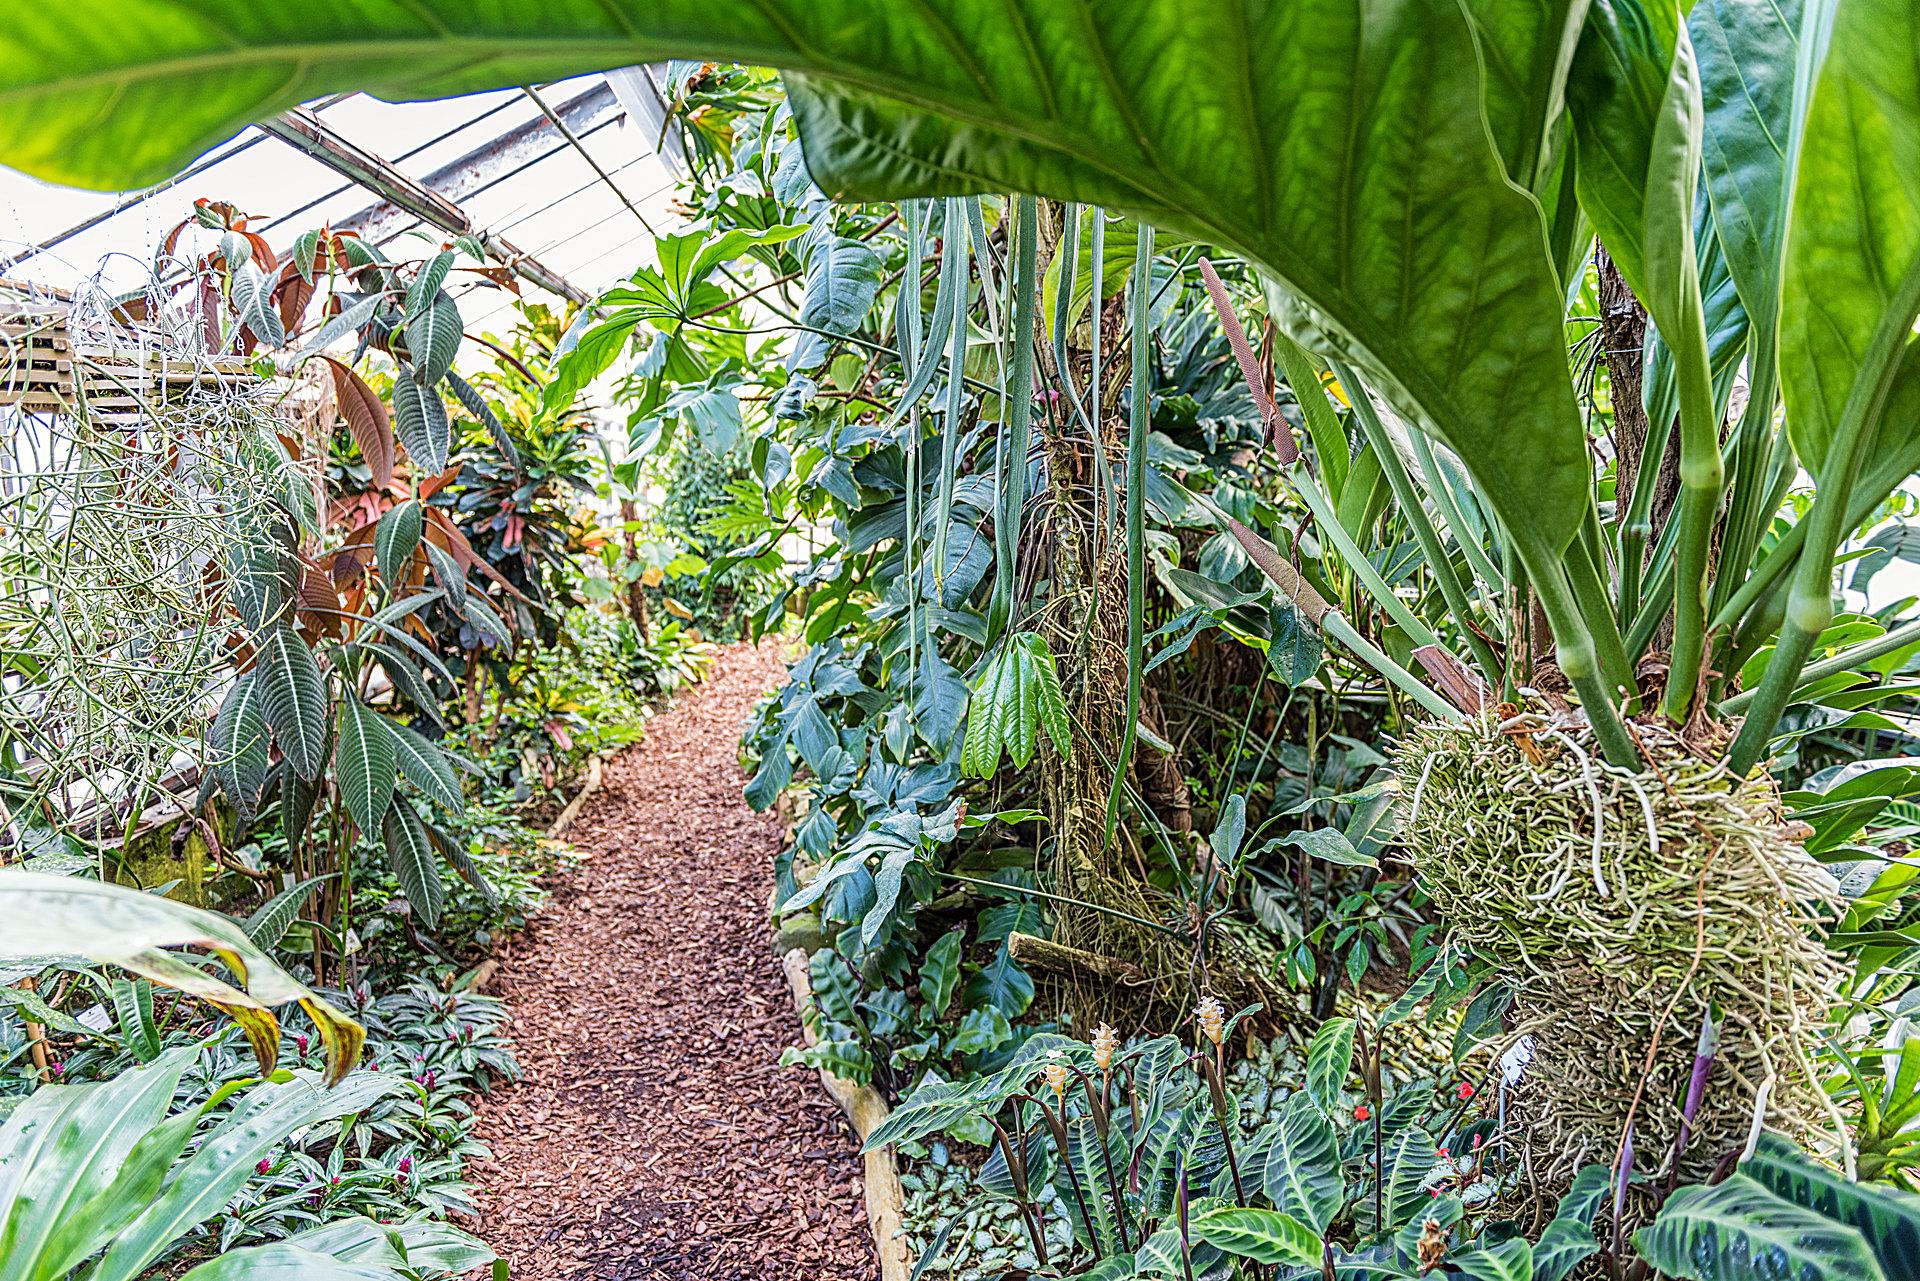 Botanischer Garten Mainz - Botanischer Garten